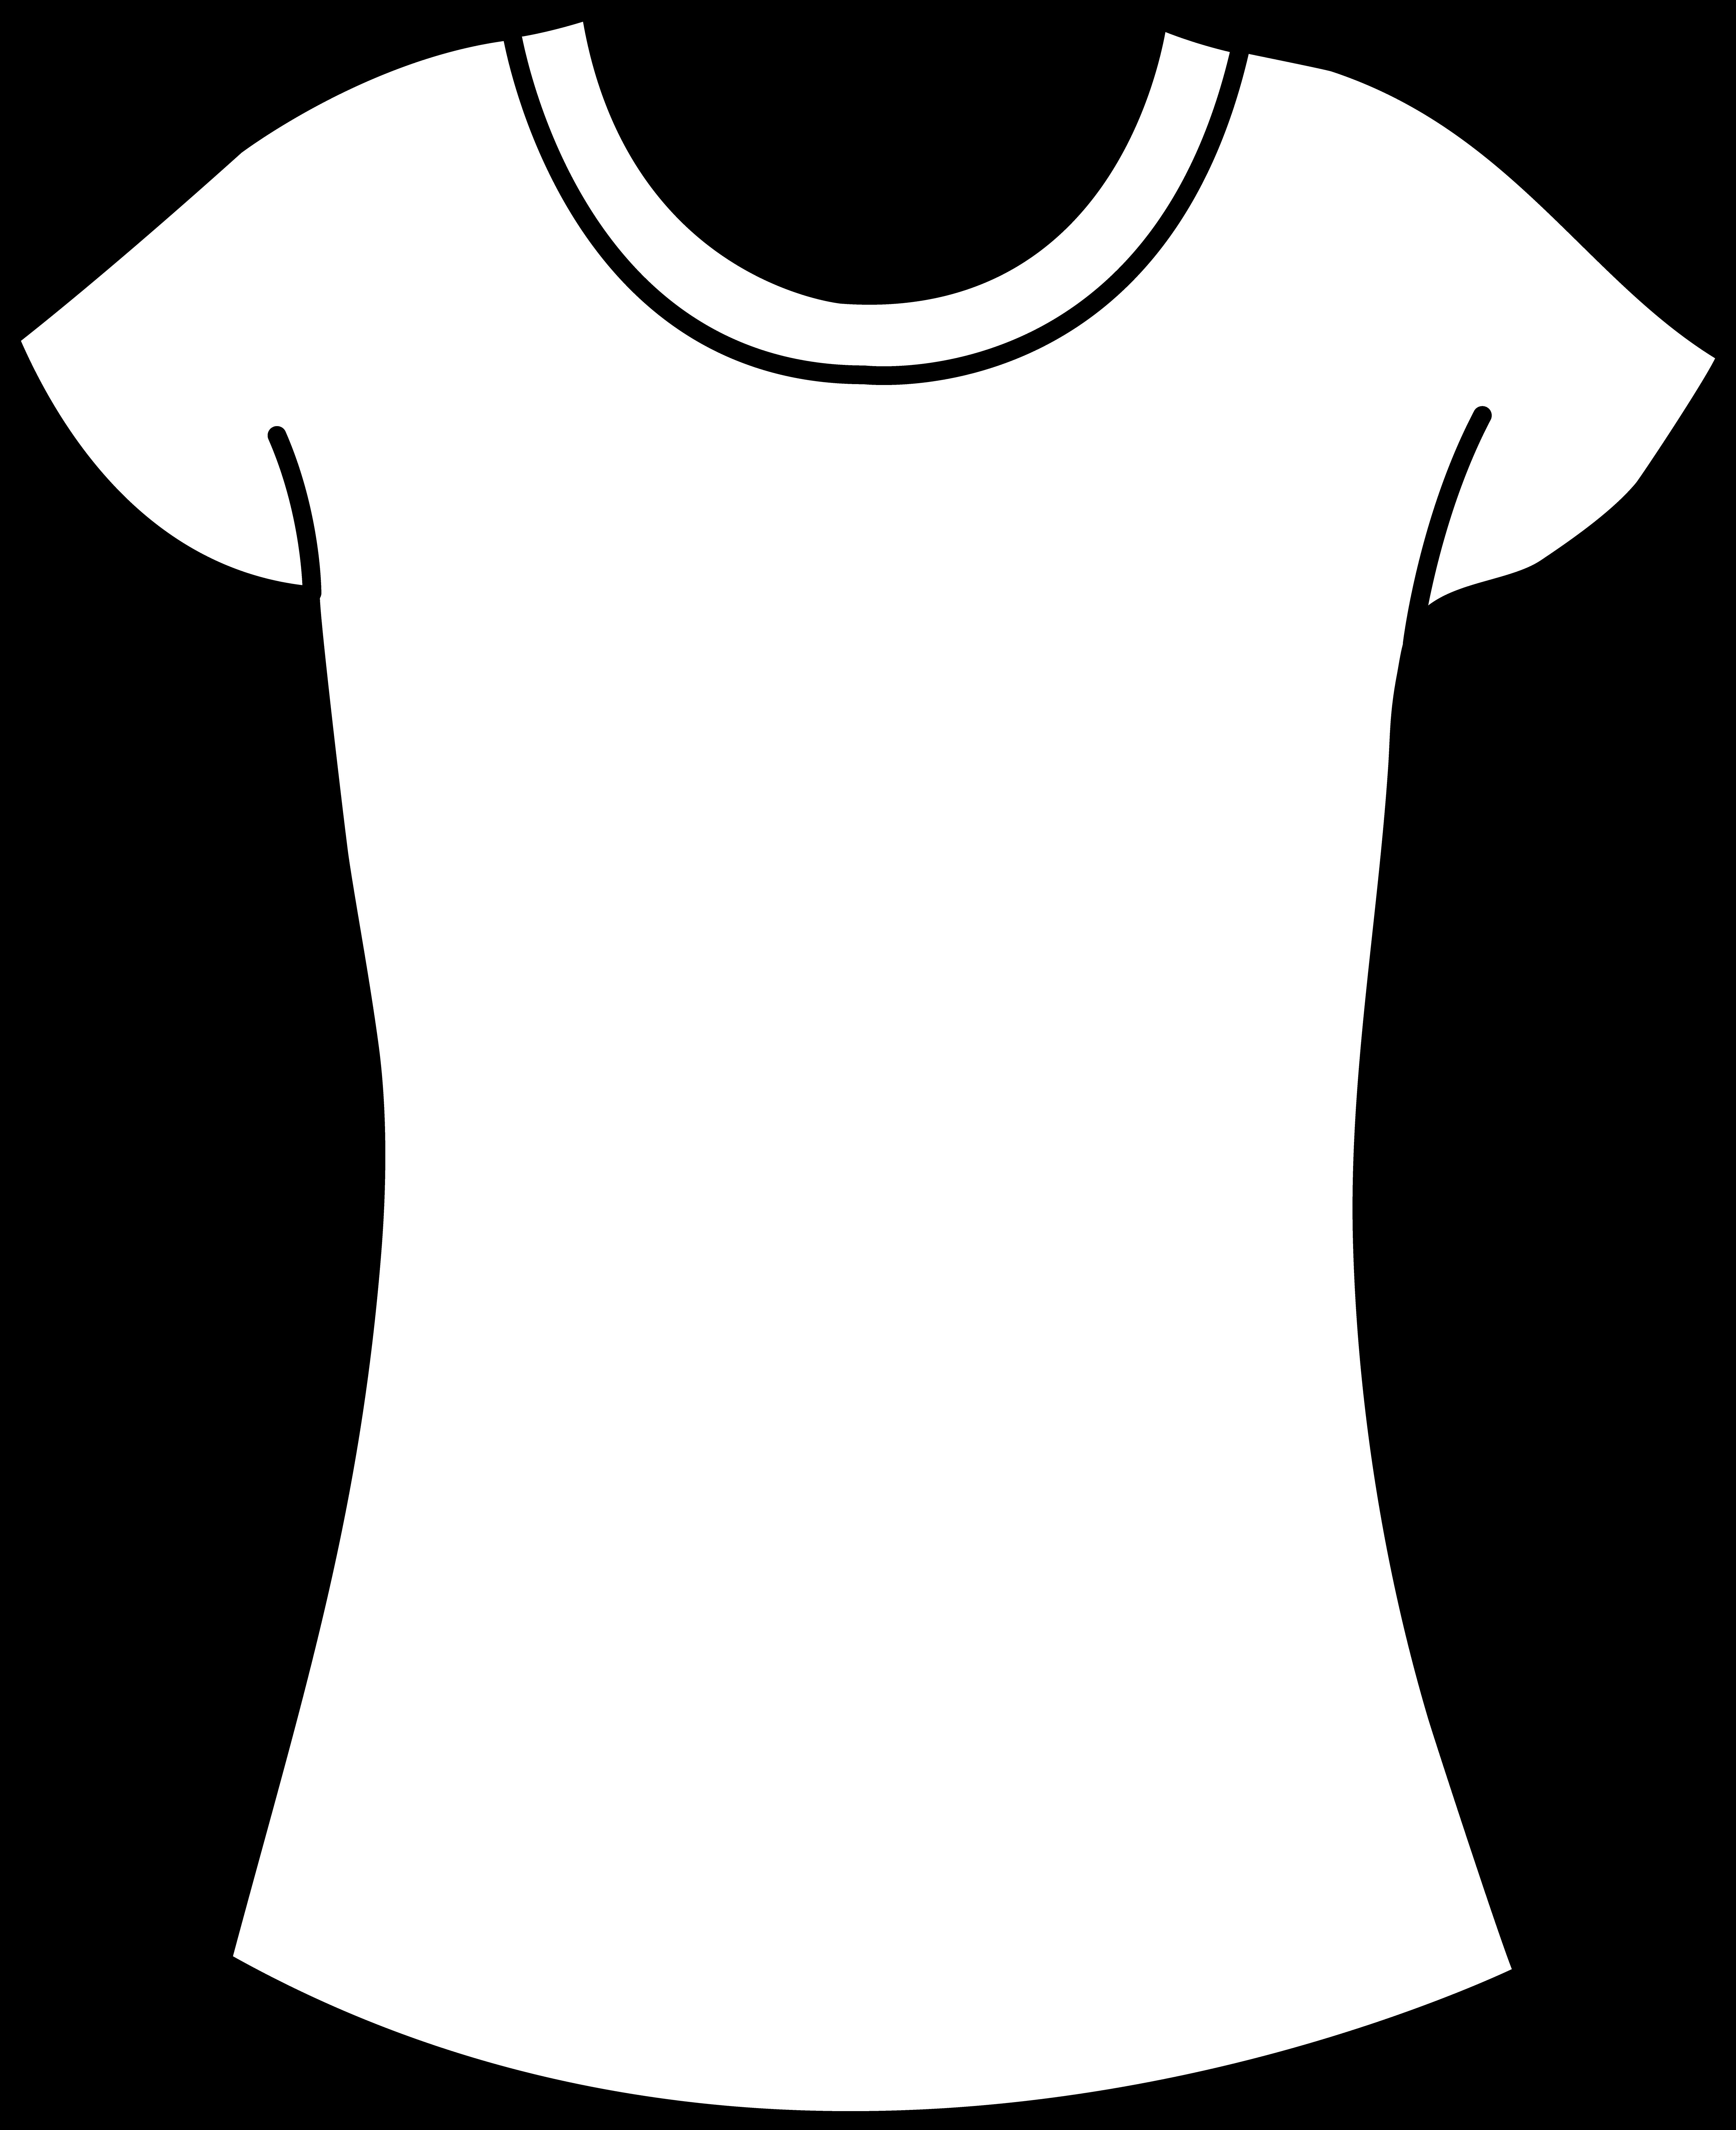 Womens t shirt clipart clipart download Top clipart female shirt - 140 transparent clip arts, images ... clipart download